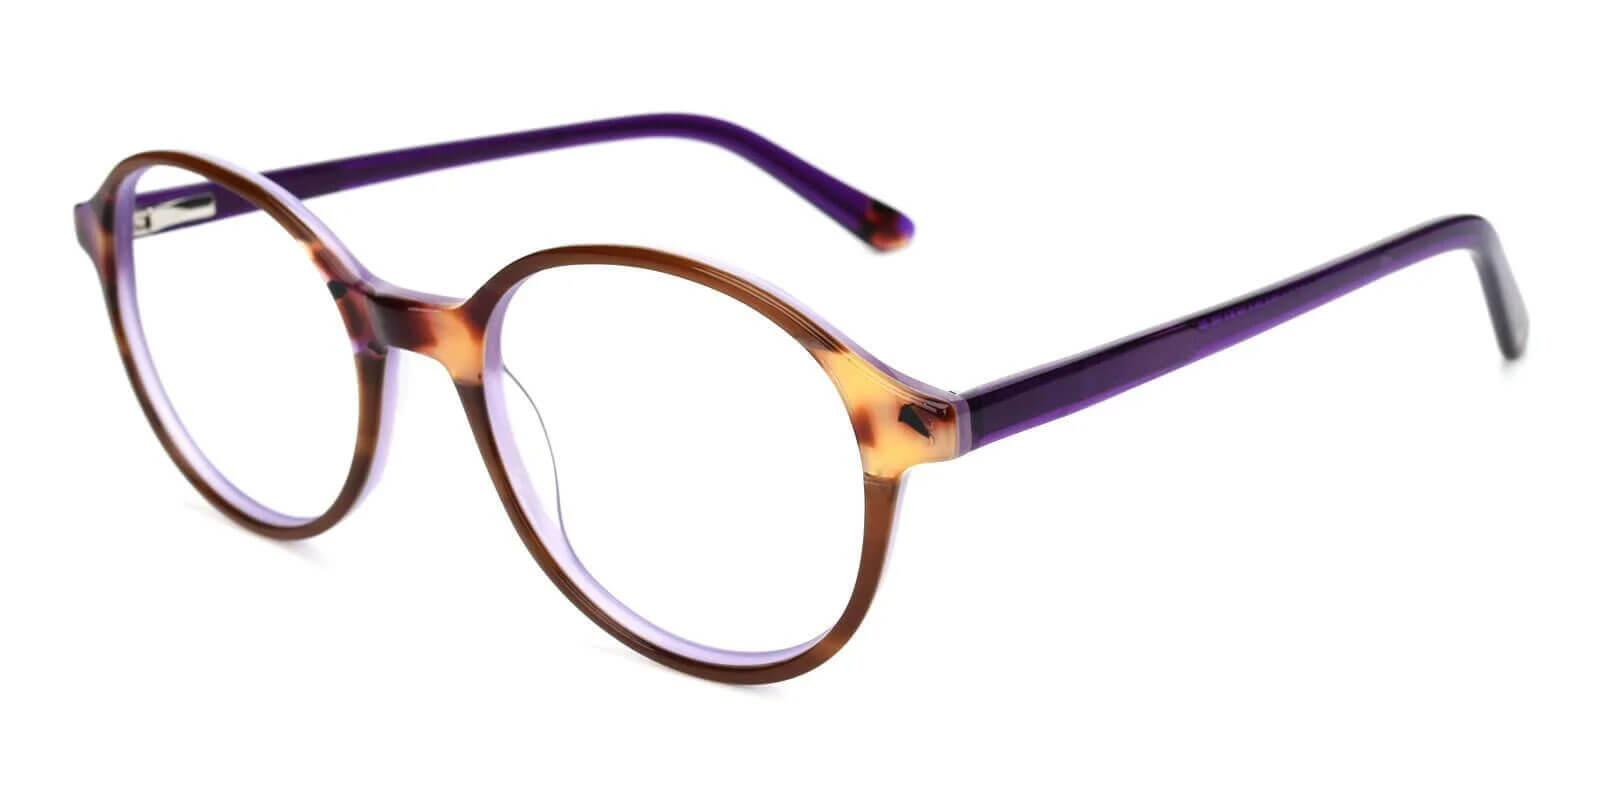 Vienna Purple Acetate Eyeglasses , UniversalBridgeFit Frames from ABBE Glasses